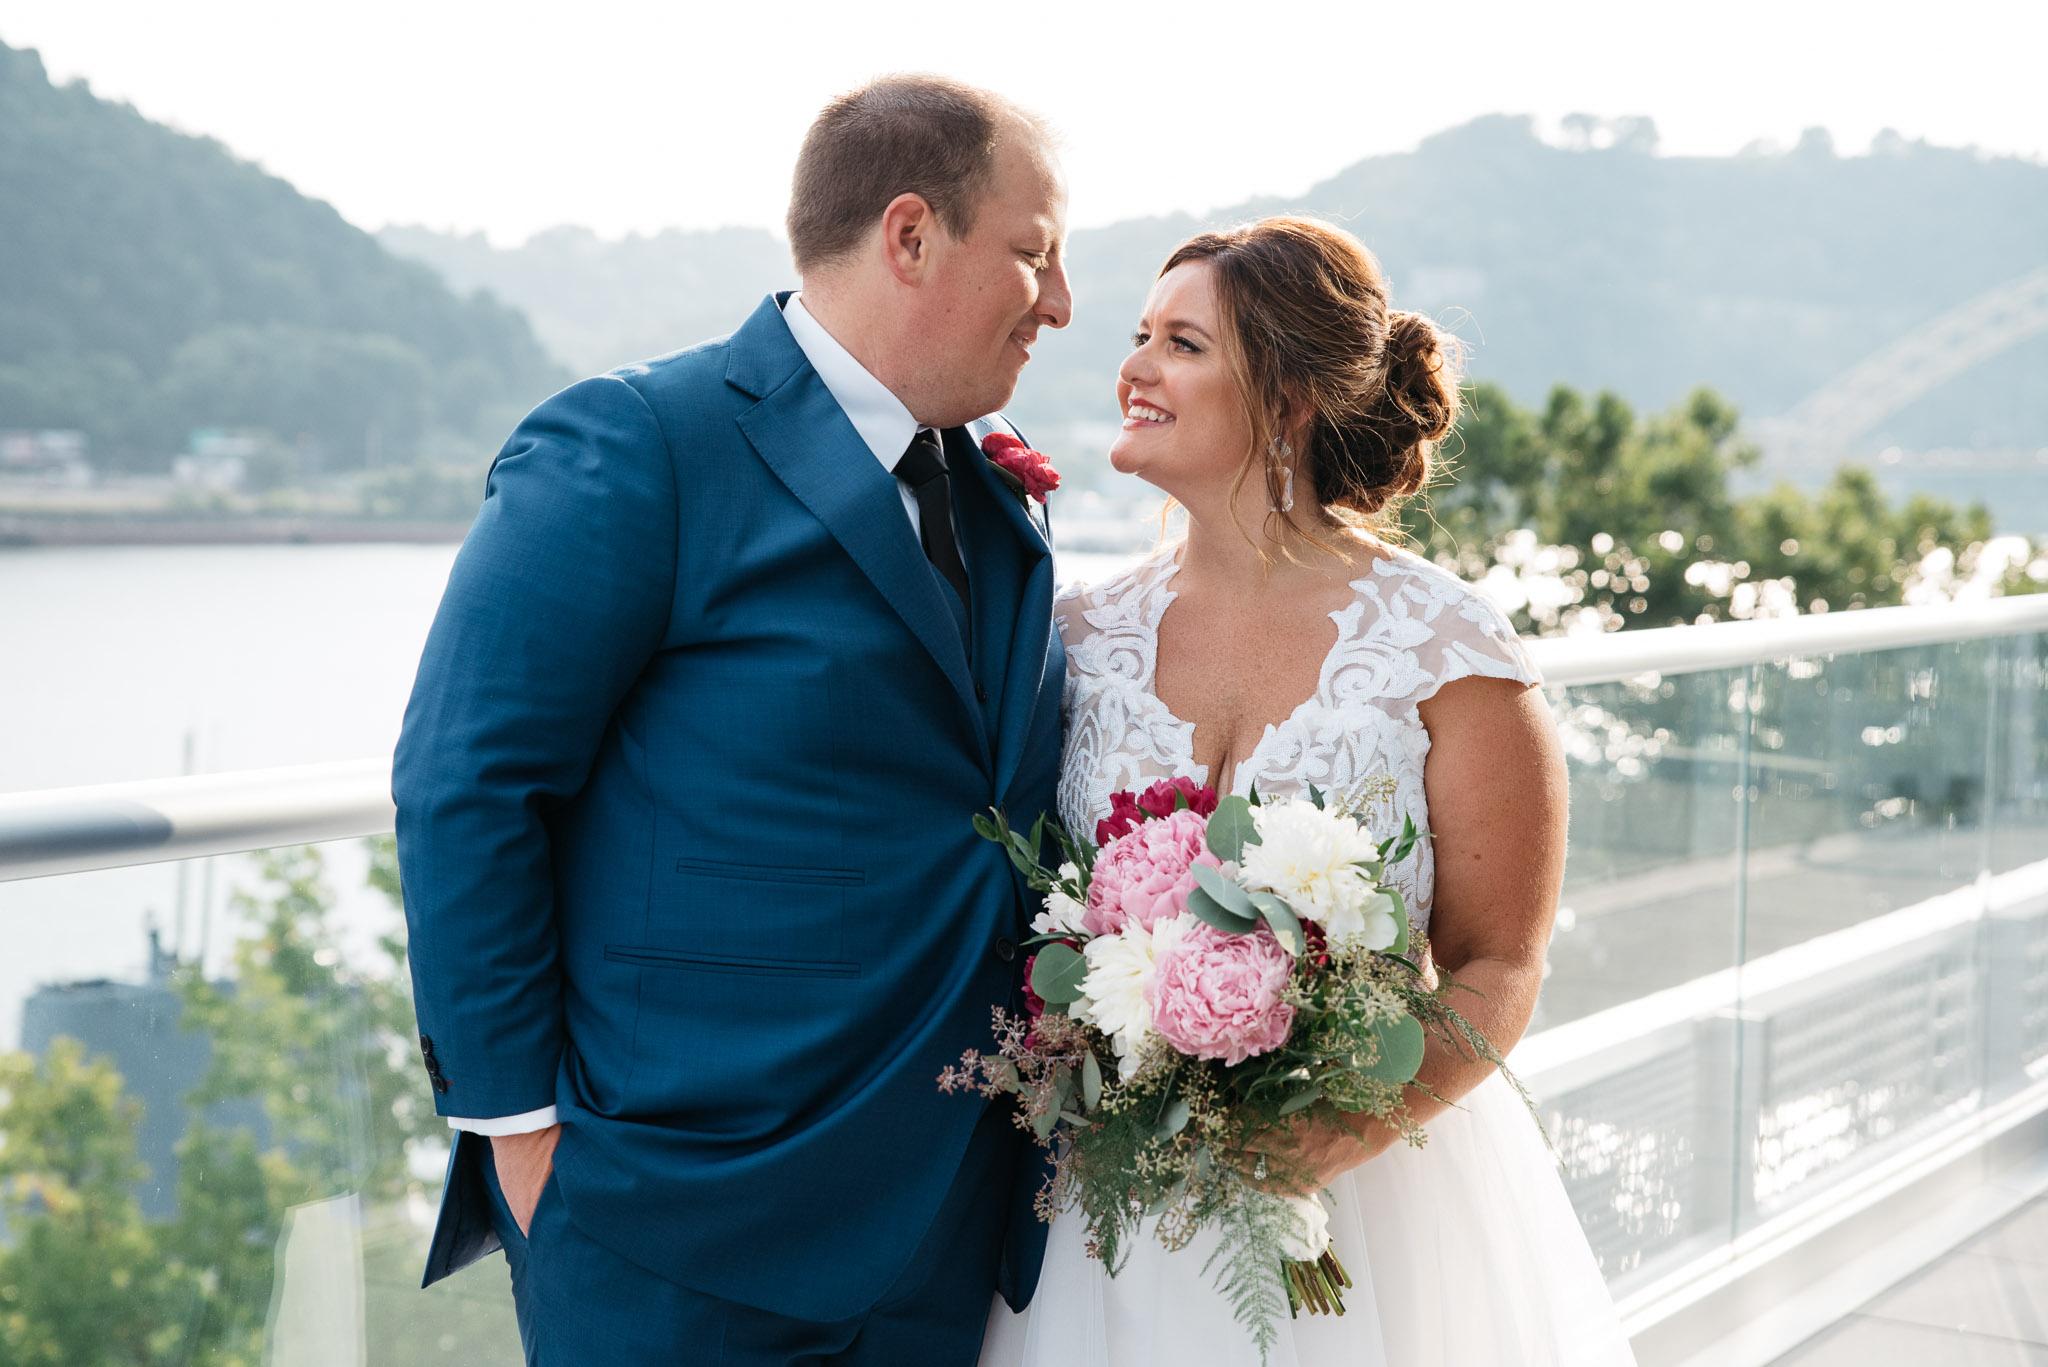 Carnegie Science Center Wedding, Pointview Hall, Pittsburgh wedding Mariah Fisher-1342.jpg